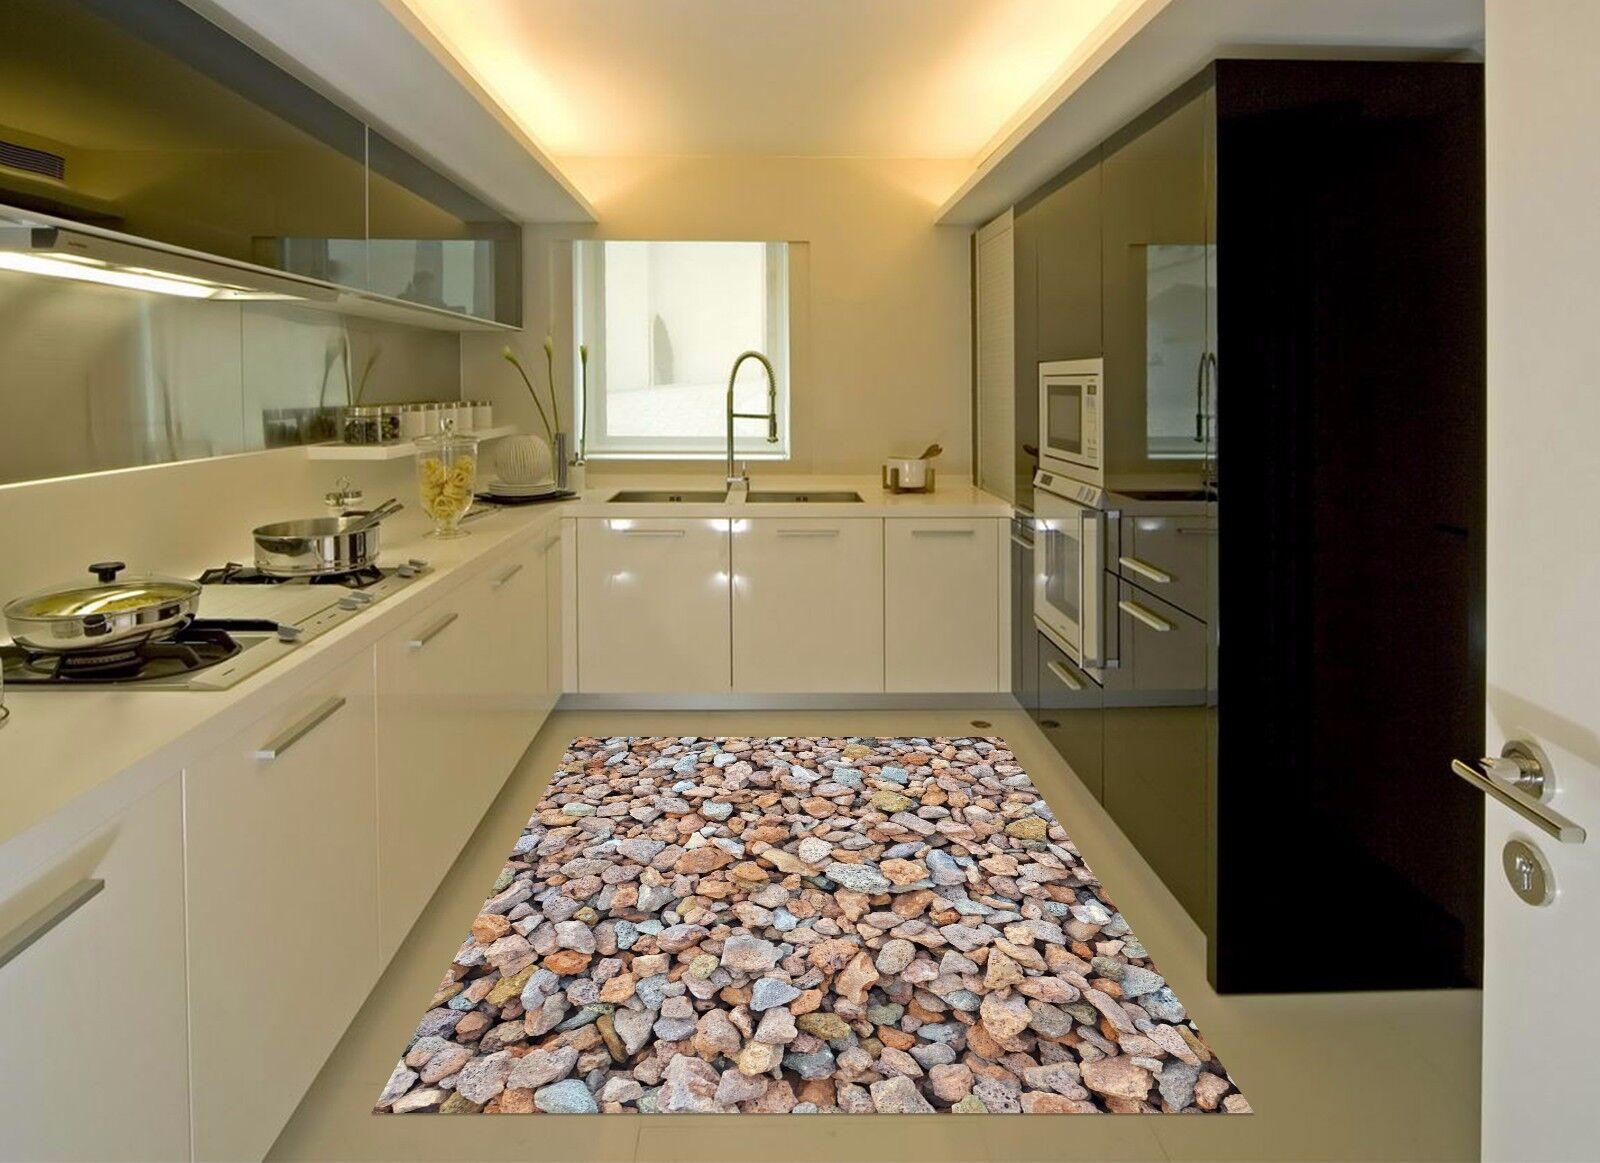 3D GRIGIO STONE 632 Cucina Tappetino Pavimento Murales Muro Carta ...